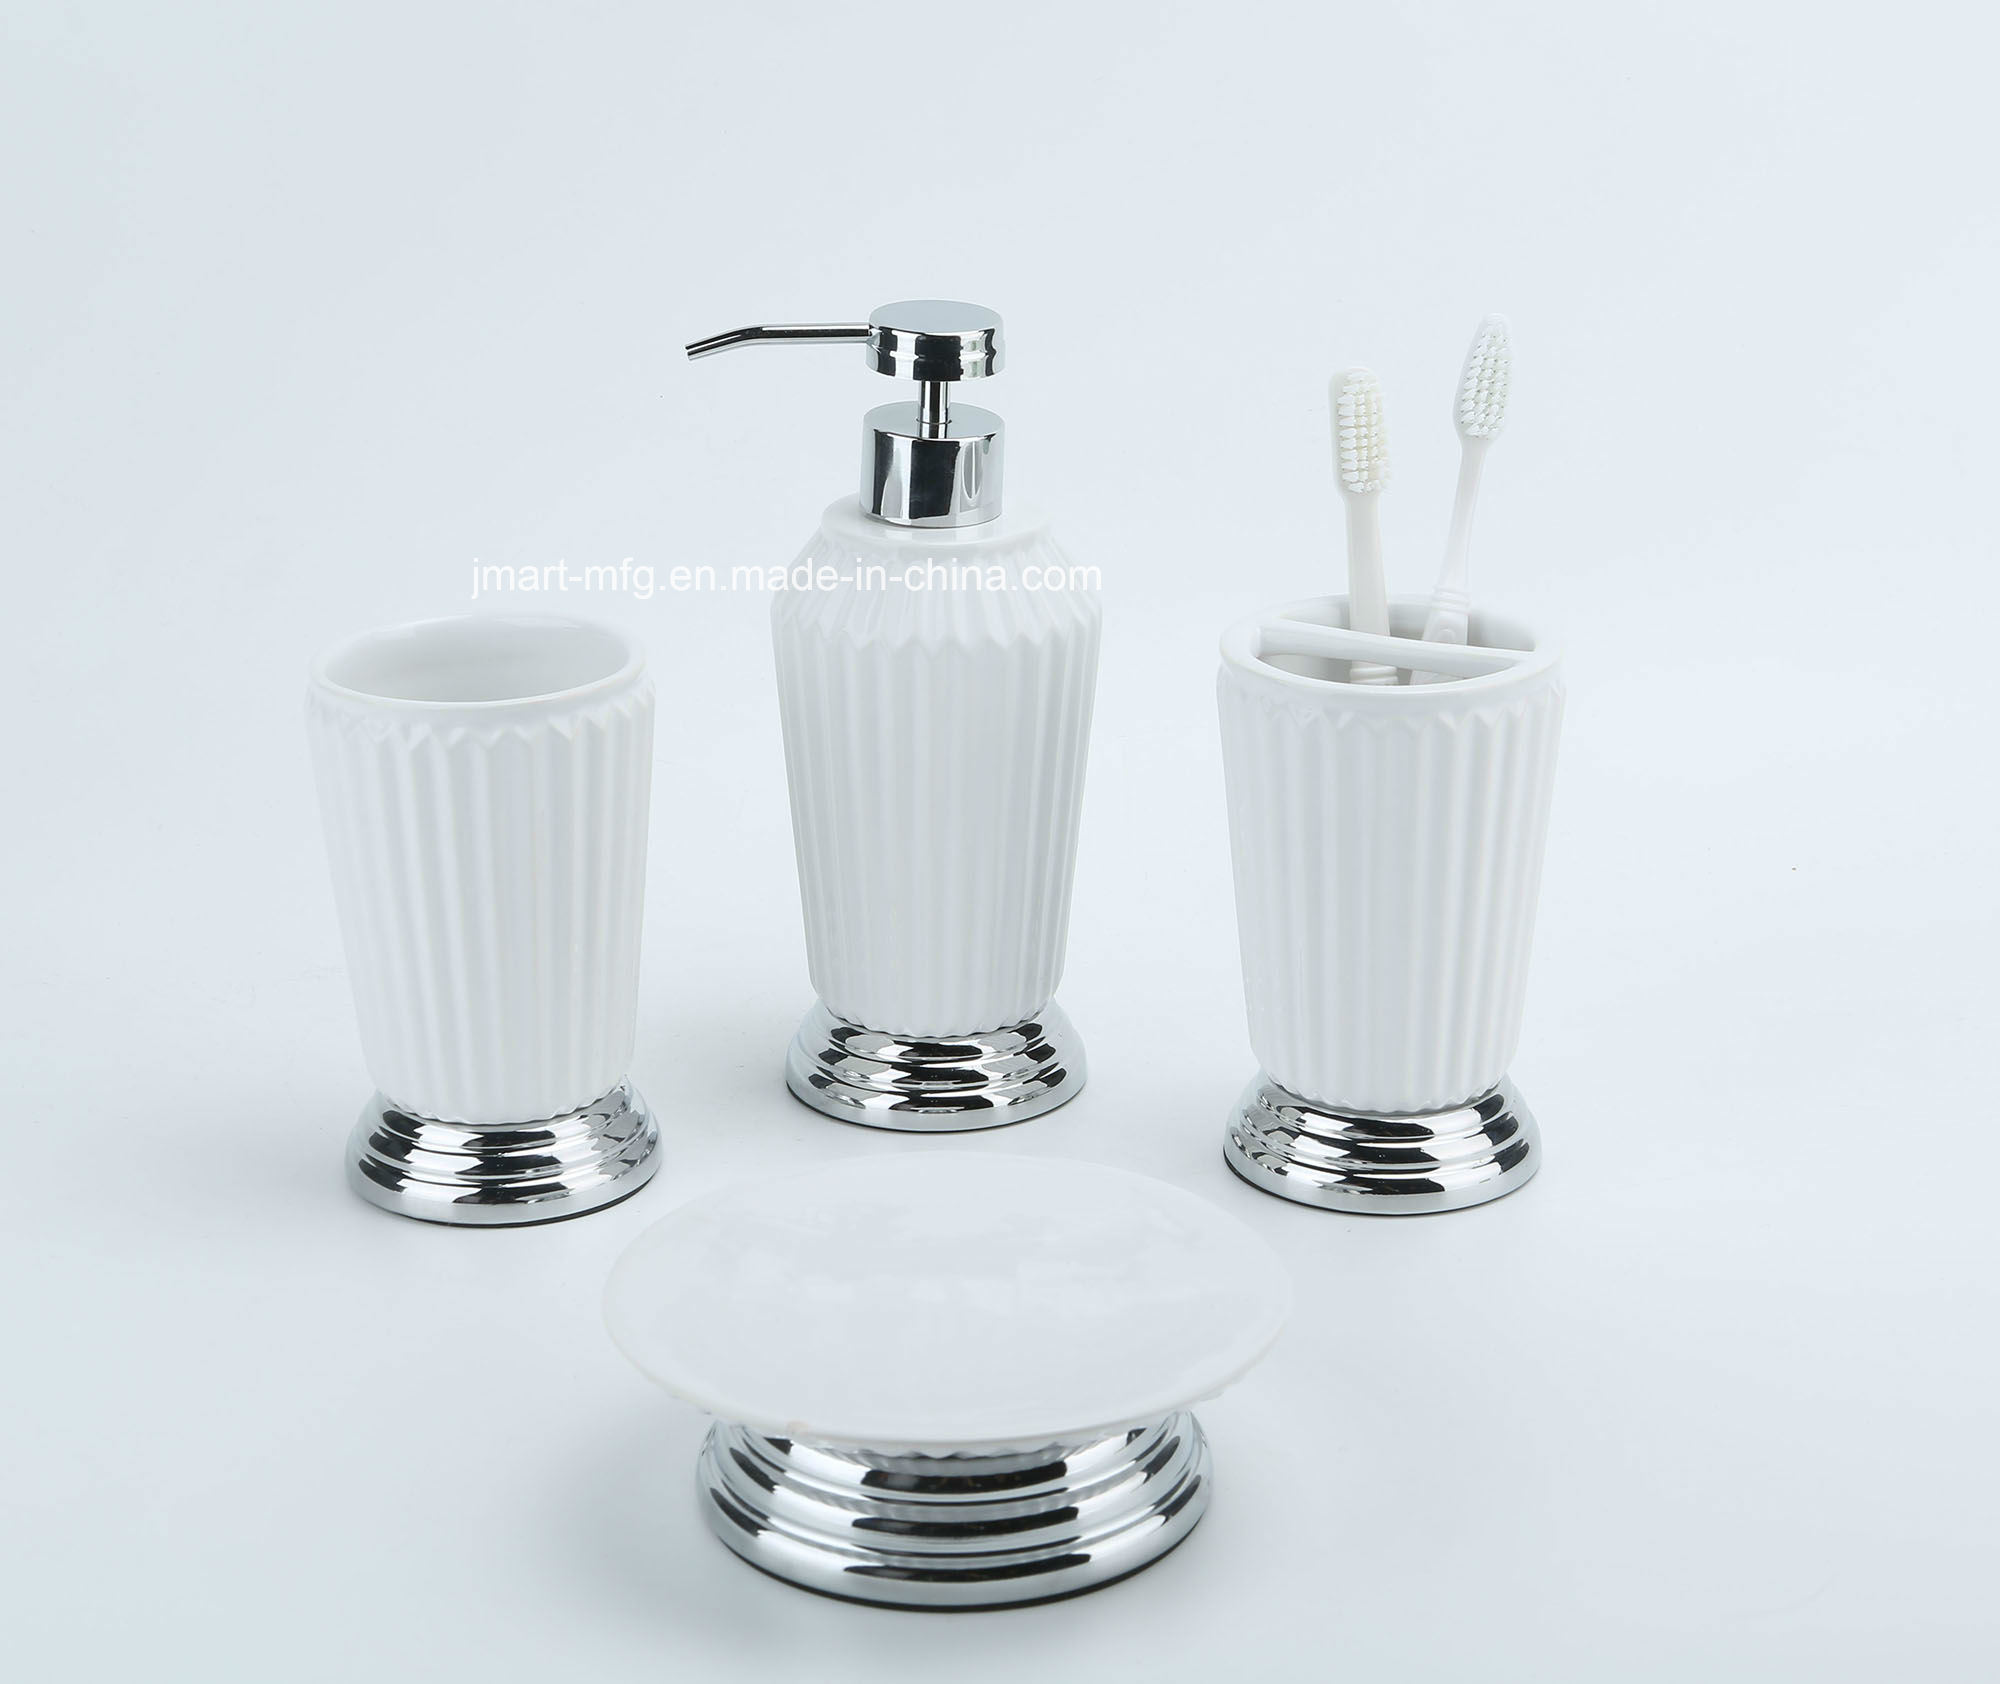 Ribbed 3D Metal Ceramic Bathroom Accessory